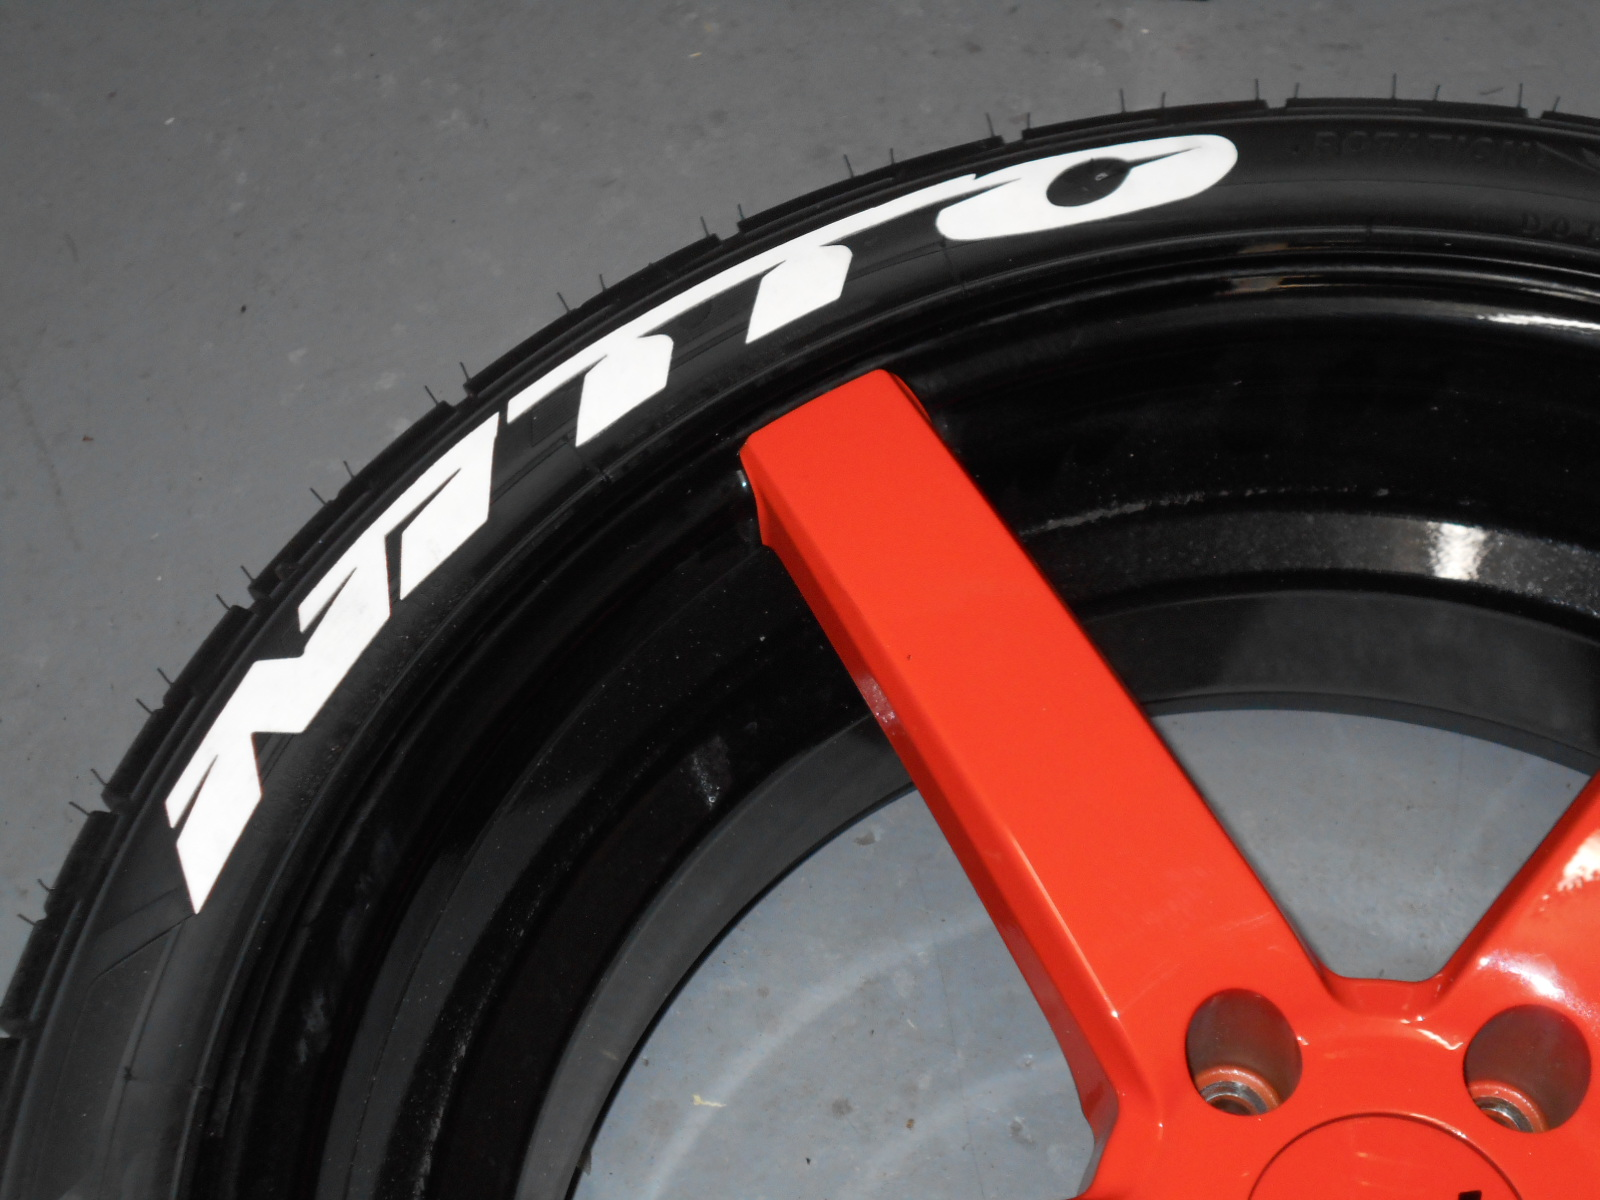 Treadwear tire graphics